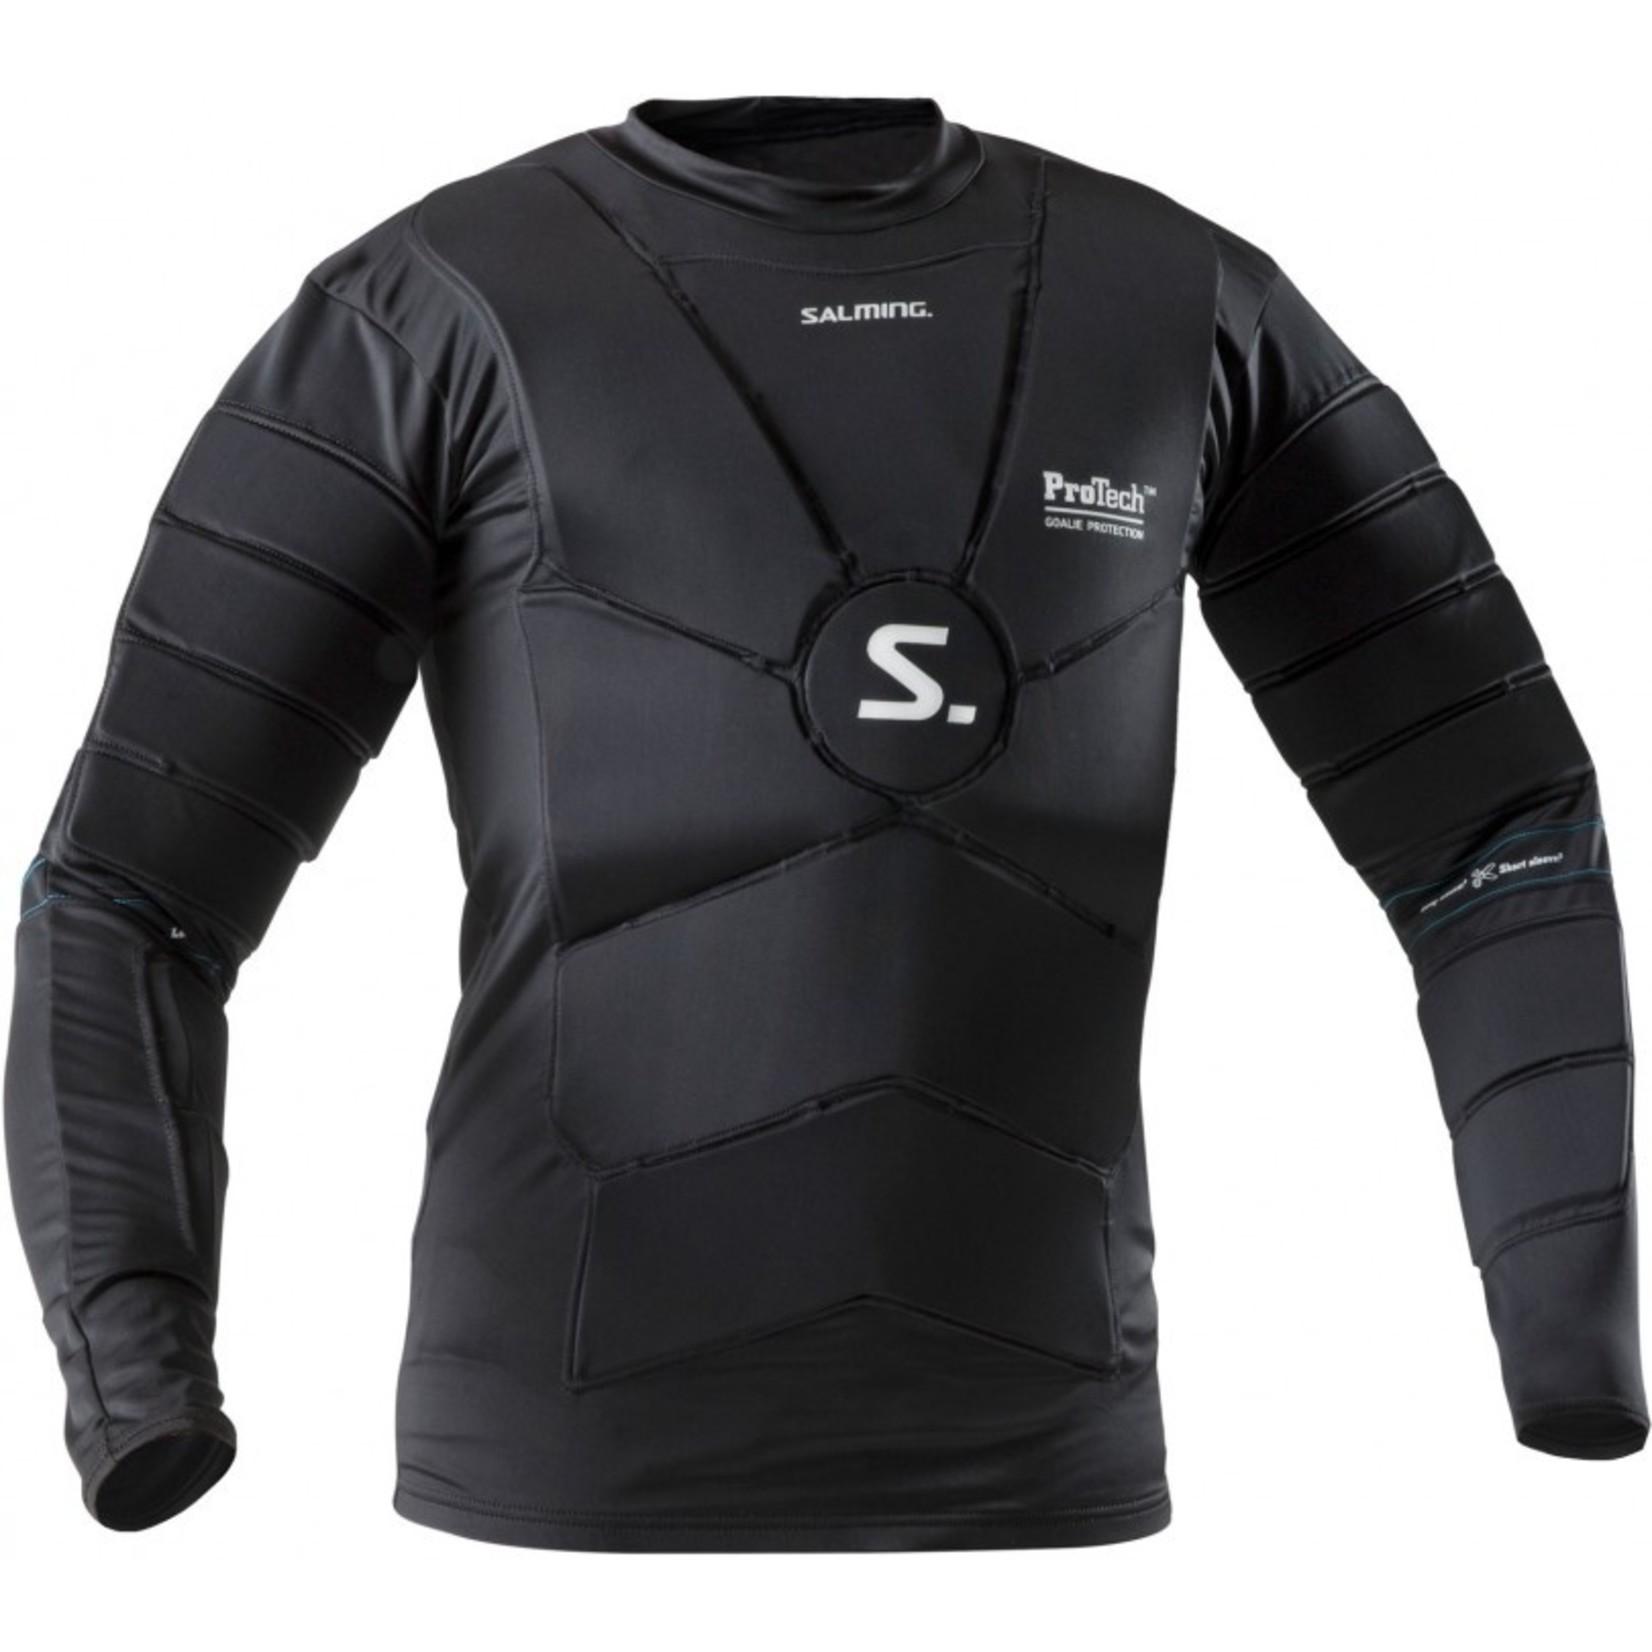 Salming Pro Tech Core Goalie Jersey